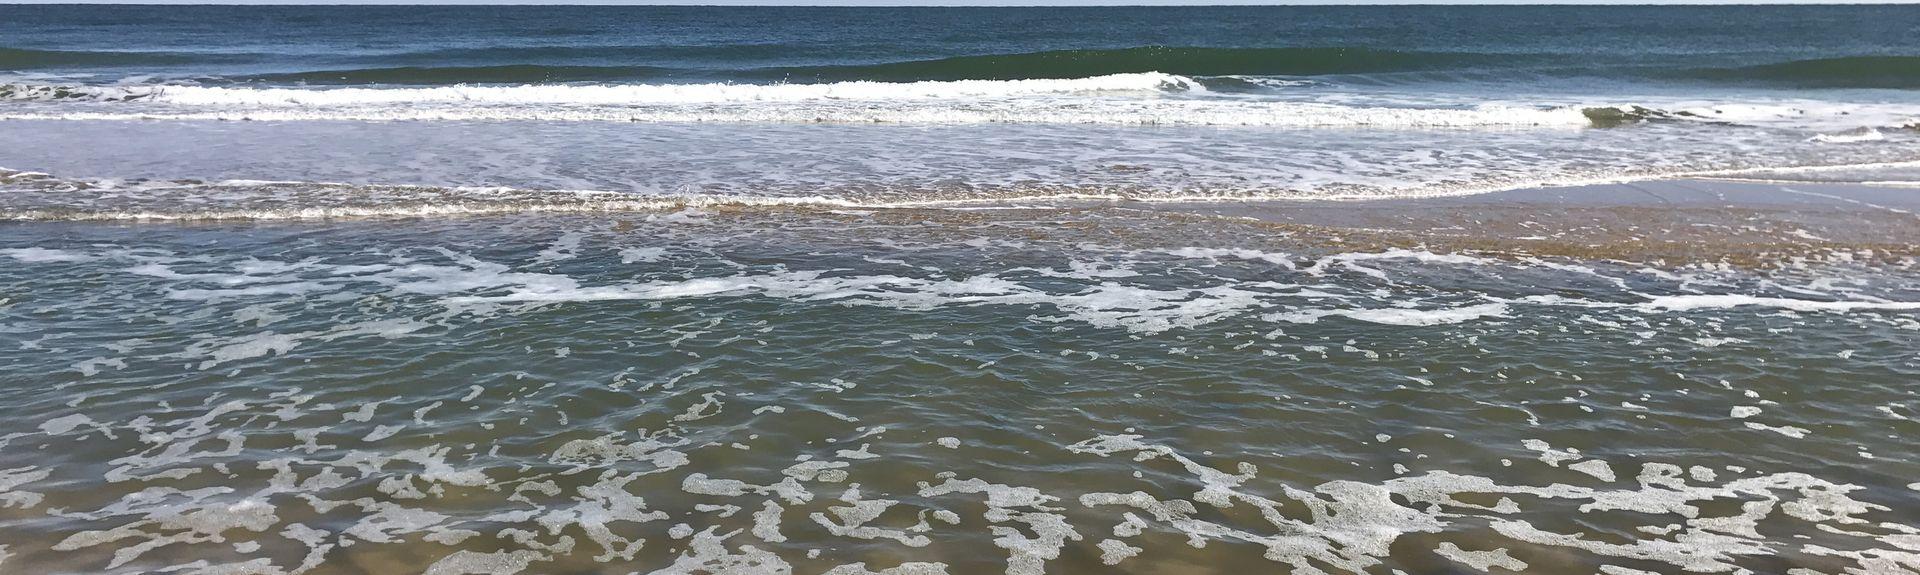 Caine Woods, Ocean City, Maryland, Verenigde Staten